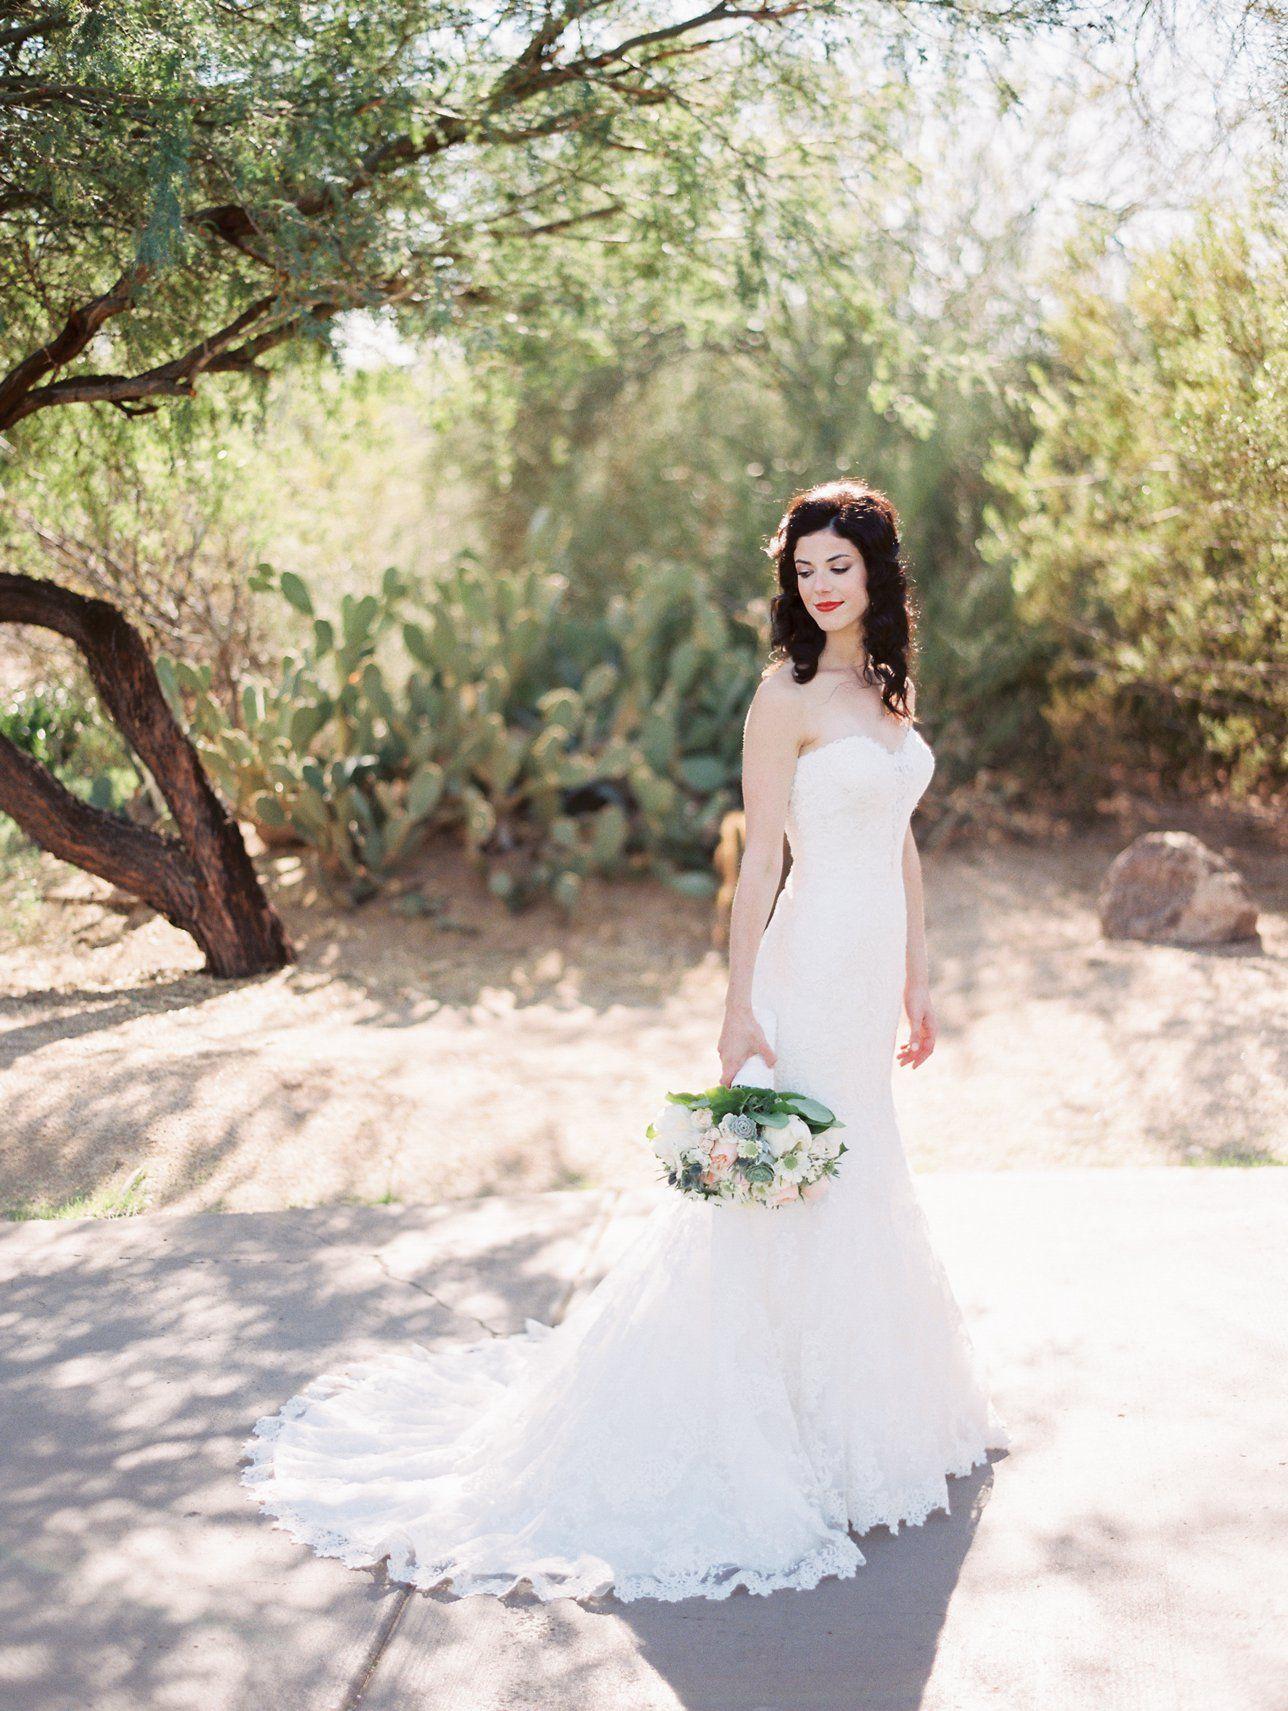 Arizona Weddings Phoenix Wedding Venues Scottsdale Desert Tucson Sedona In: Desert Country Wedding Dresses At Websimilar.org